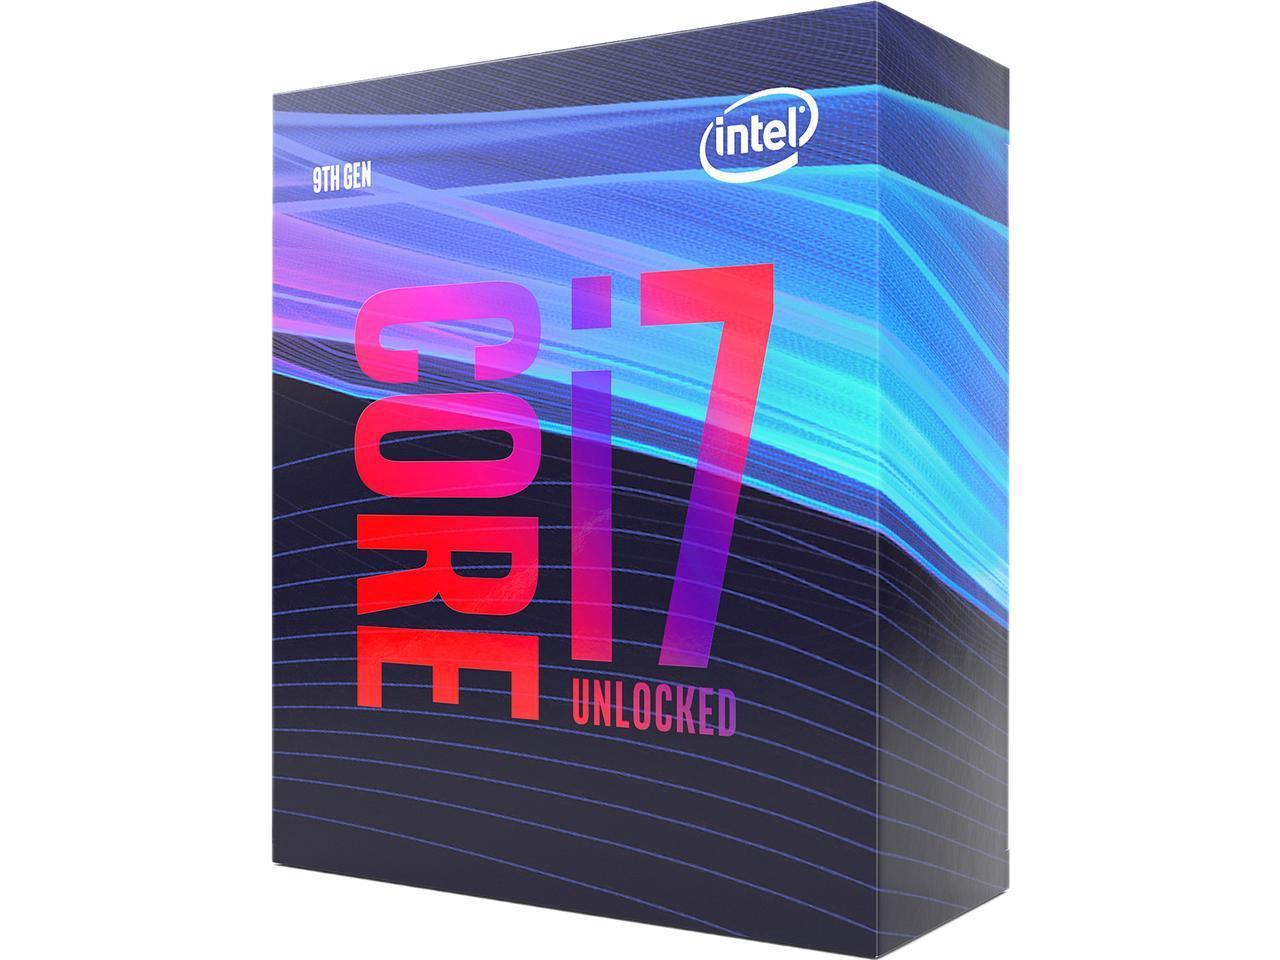 Intel Core i7-9700K (Amazon and Newegg) $349.99. Ends Friday